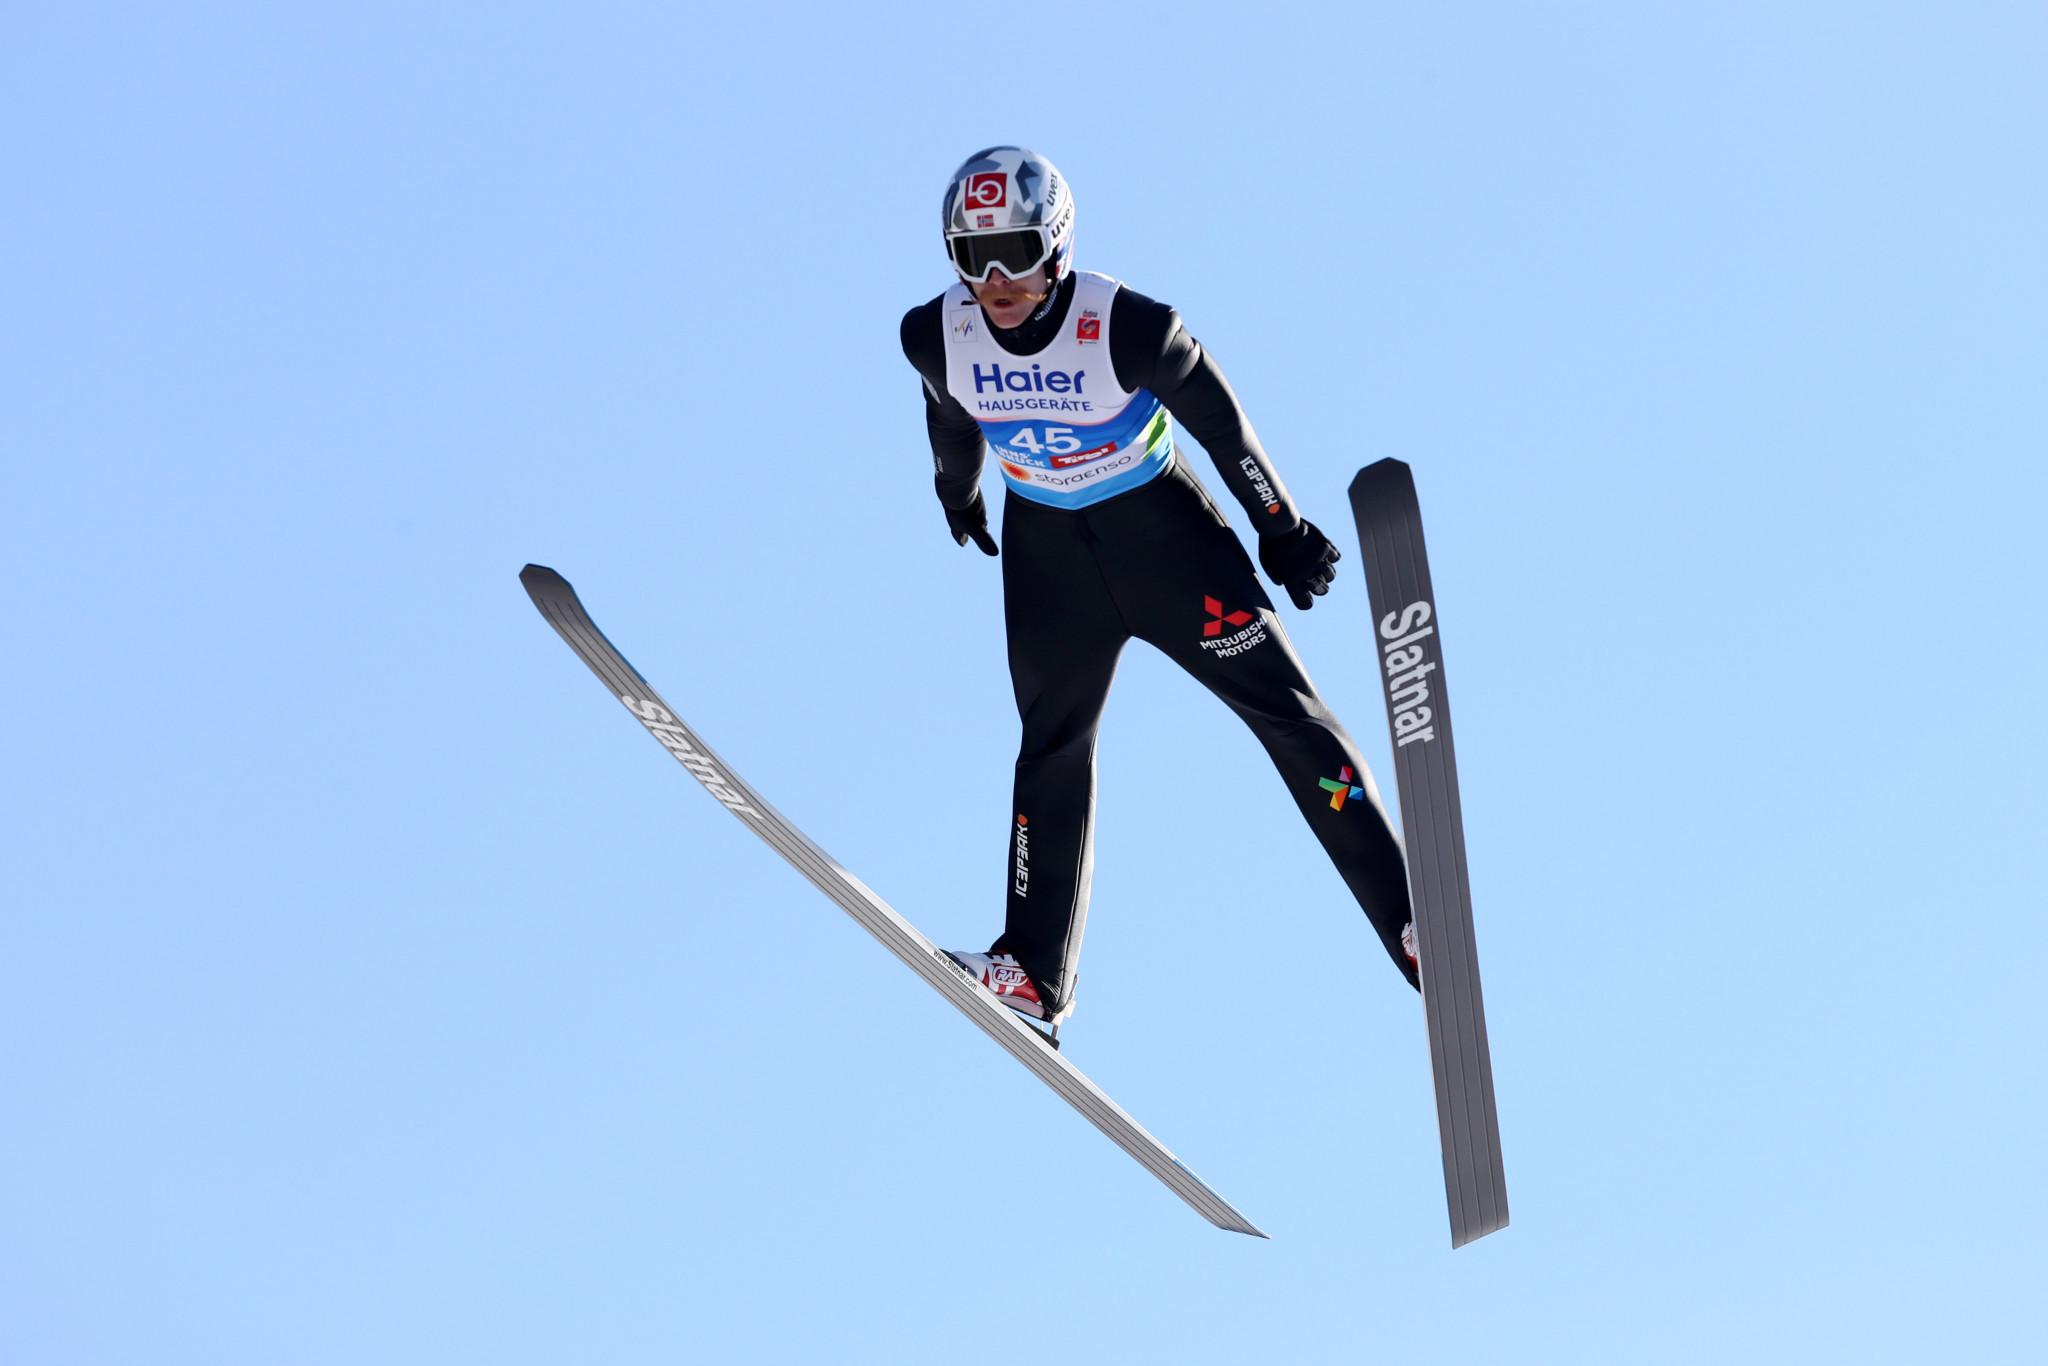 Ski jumper Johansson has back surgery to prepare for new World Cup season